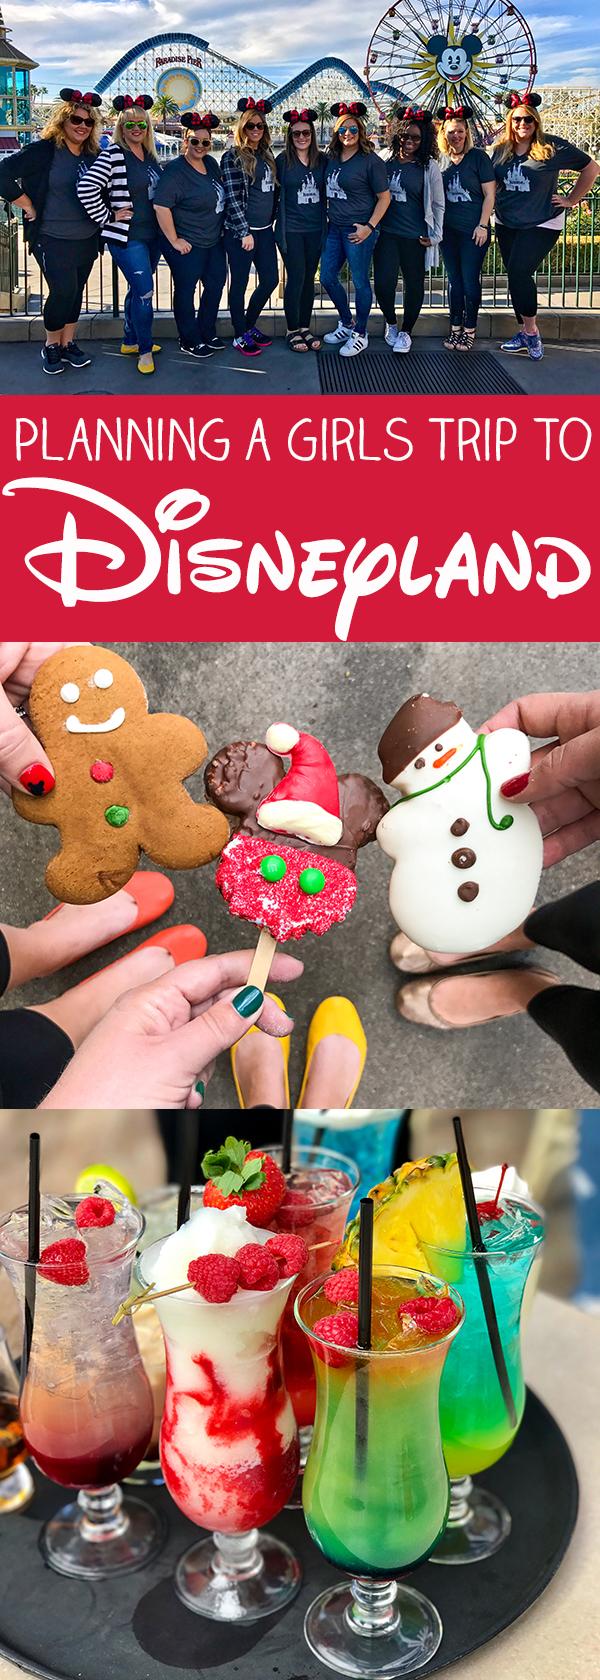 Planning a Girls Trip to Disneyland